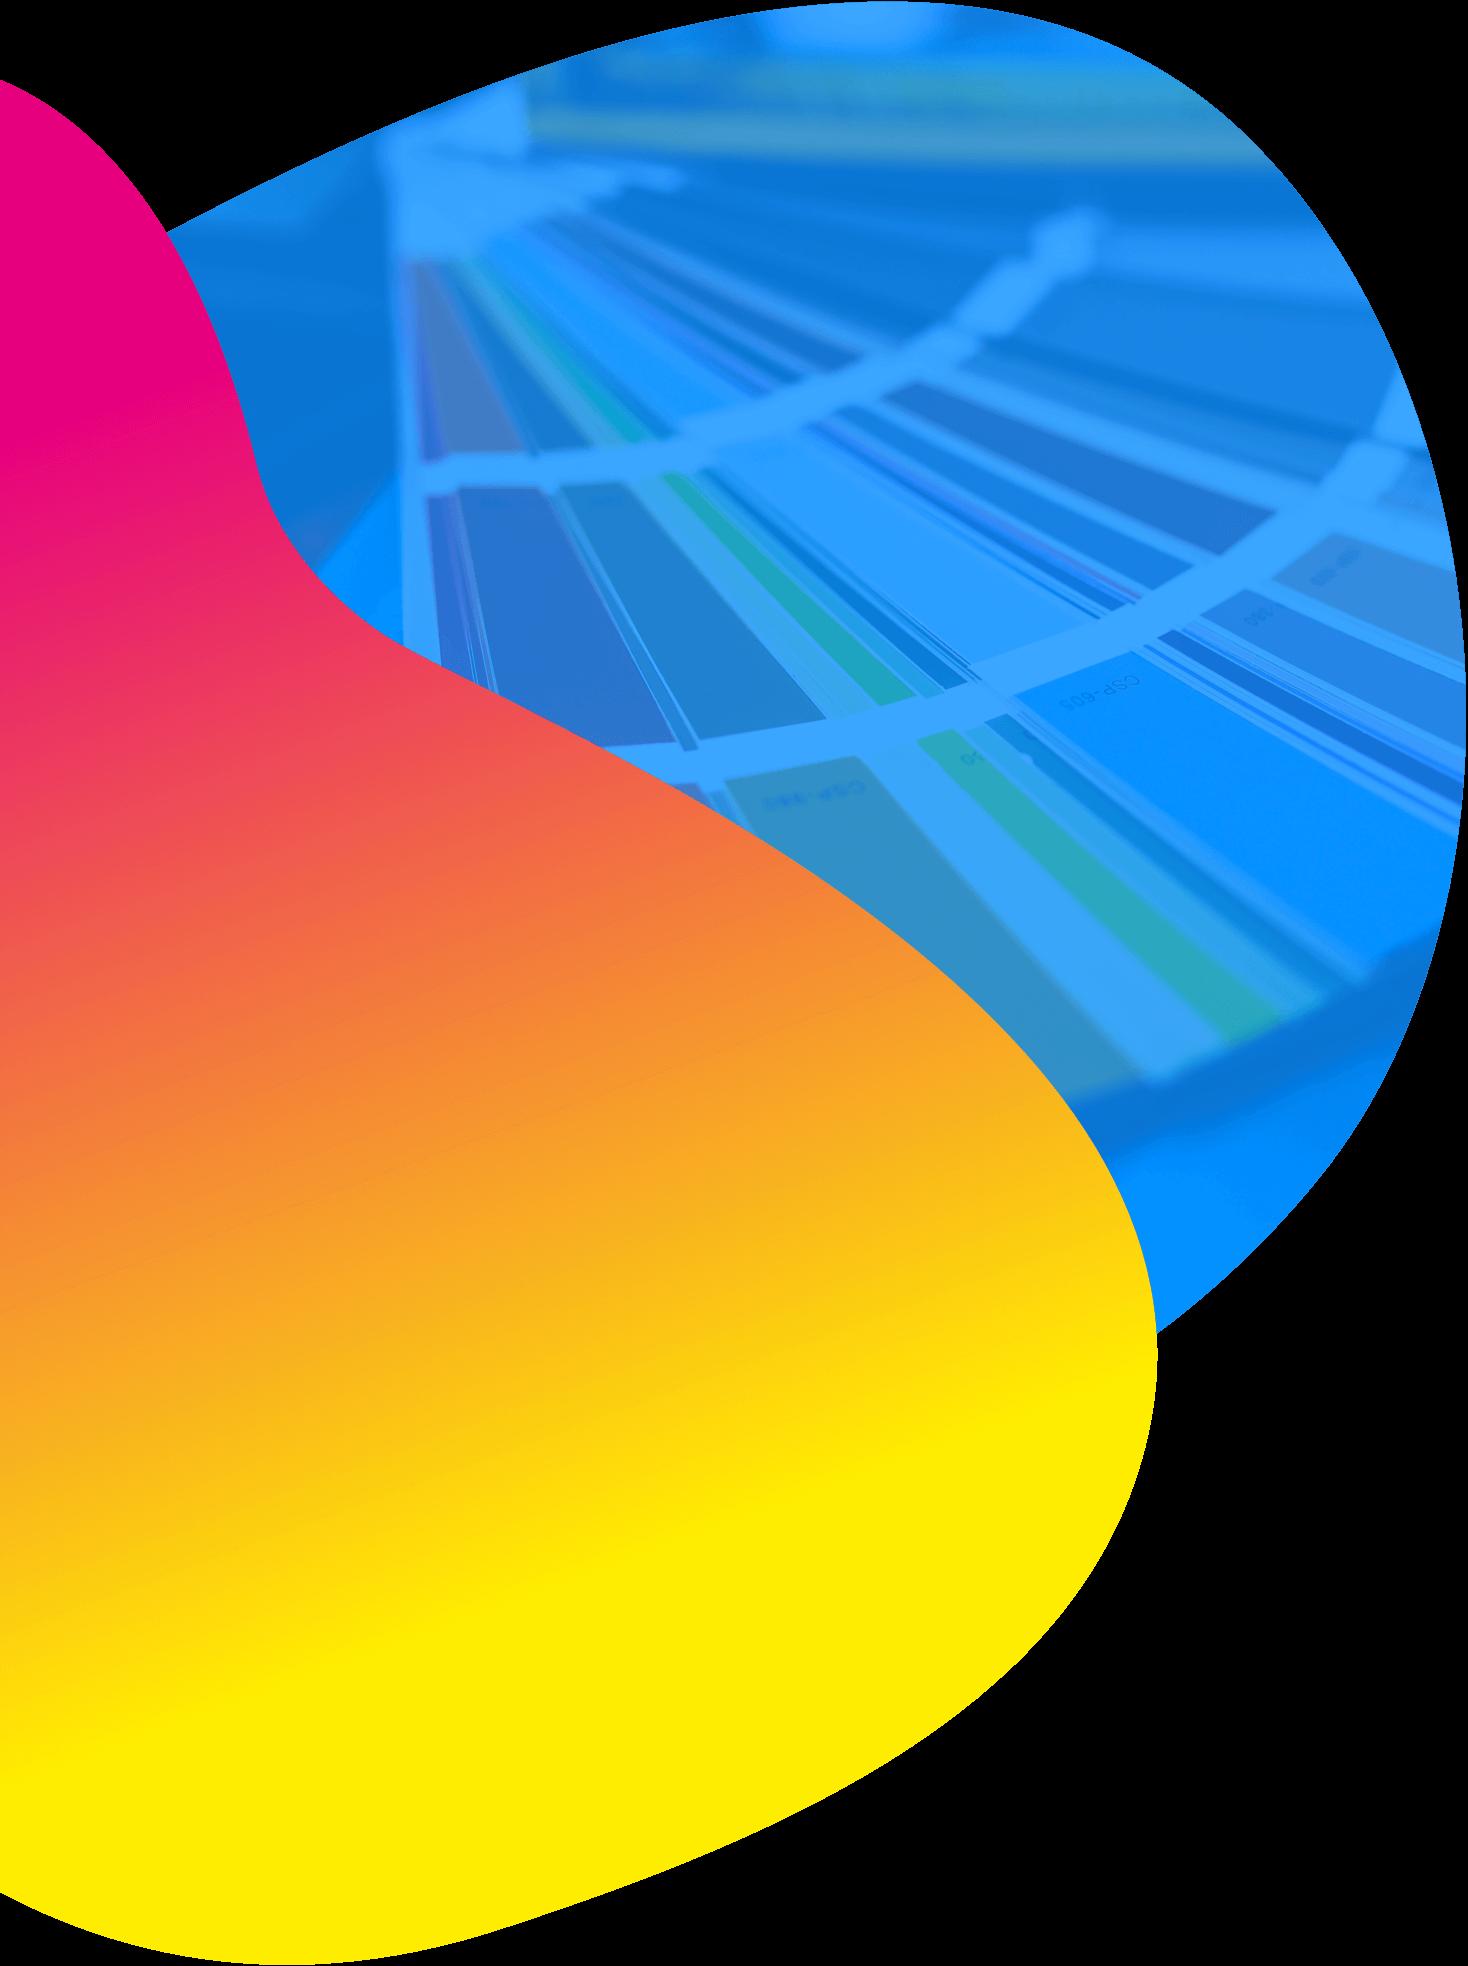 Branding-print-wabisabu